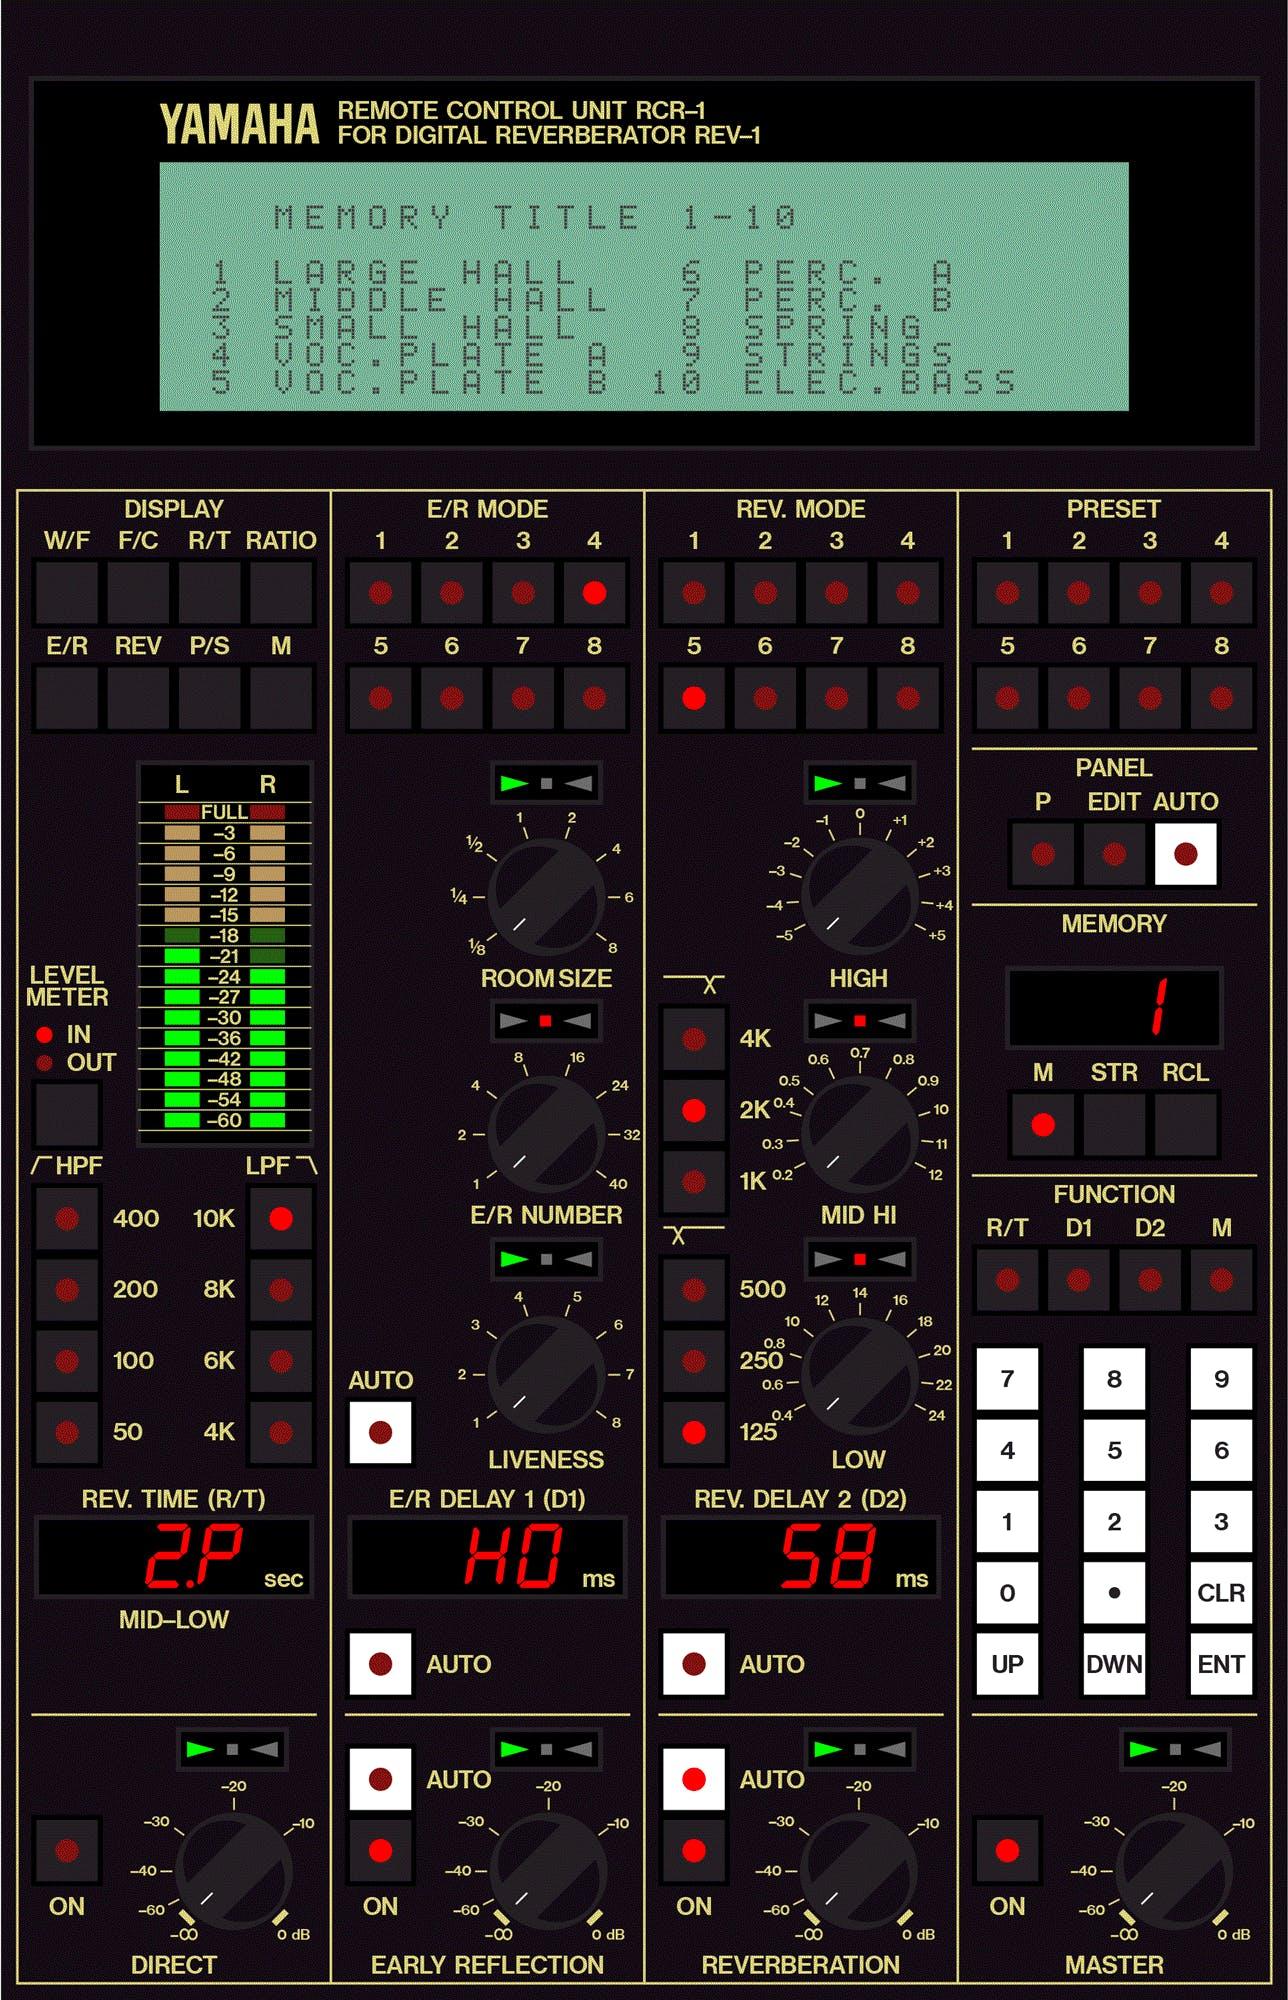 Yamaha RCR1 remote control for REV1